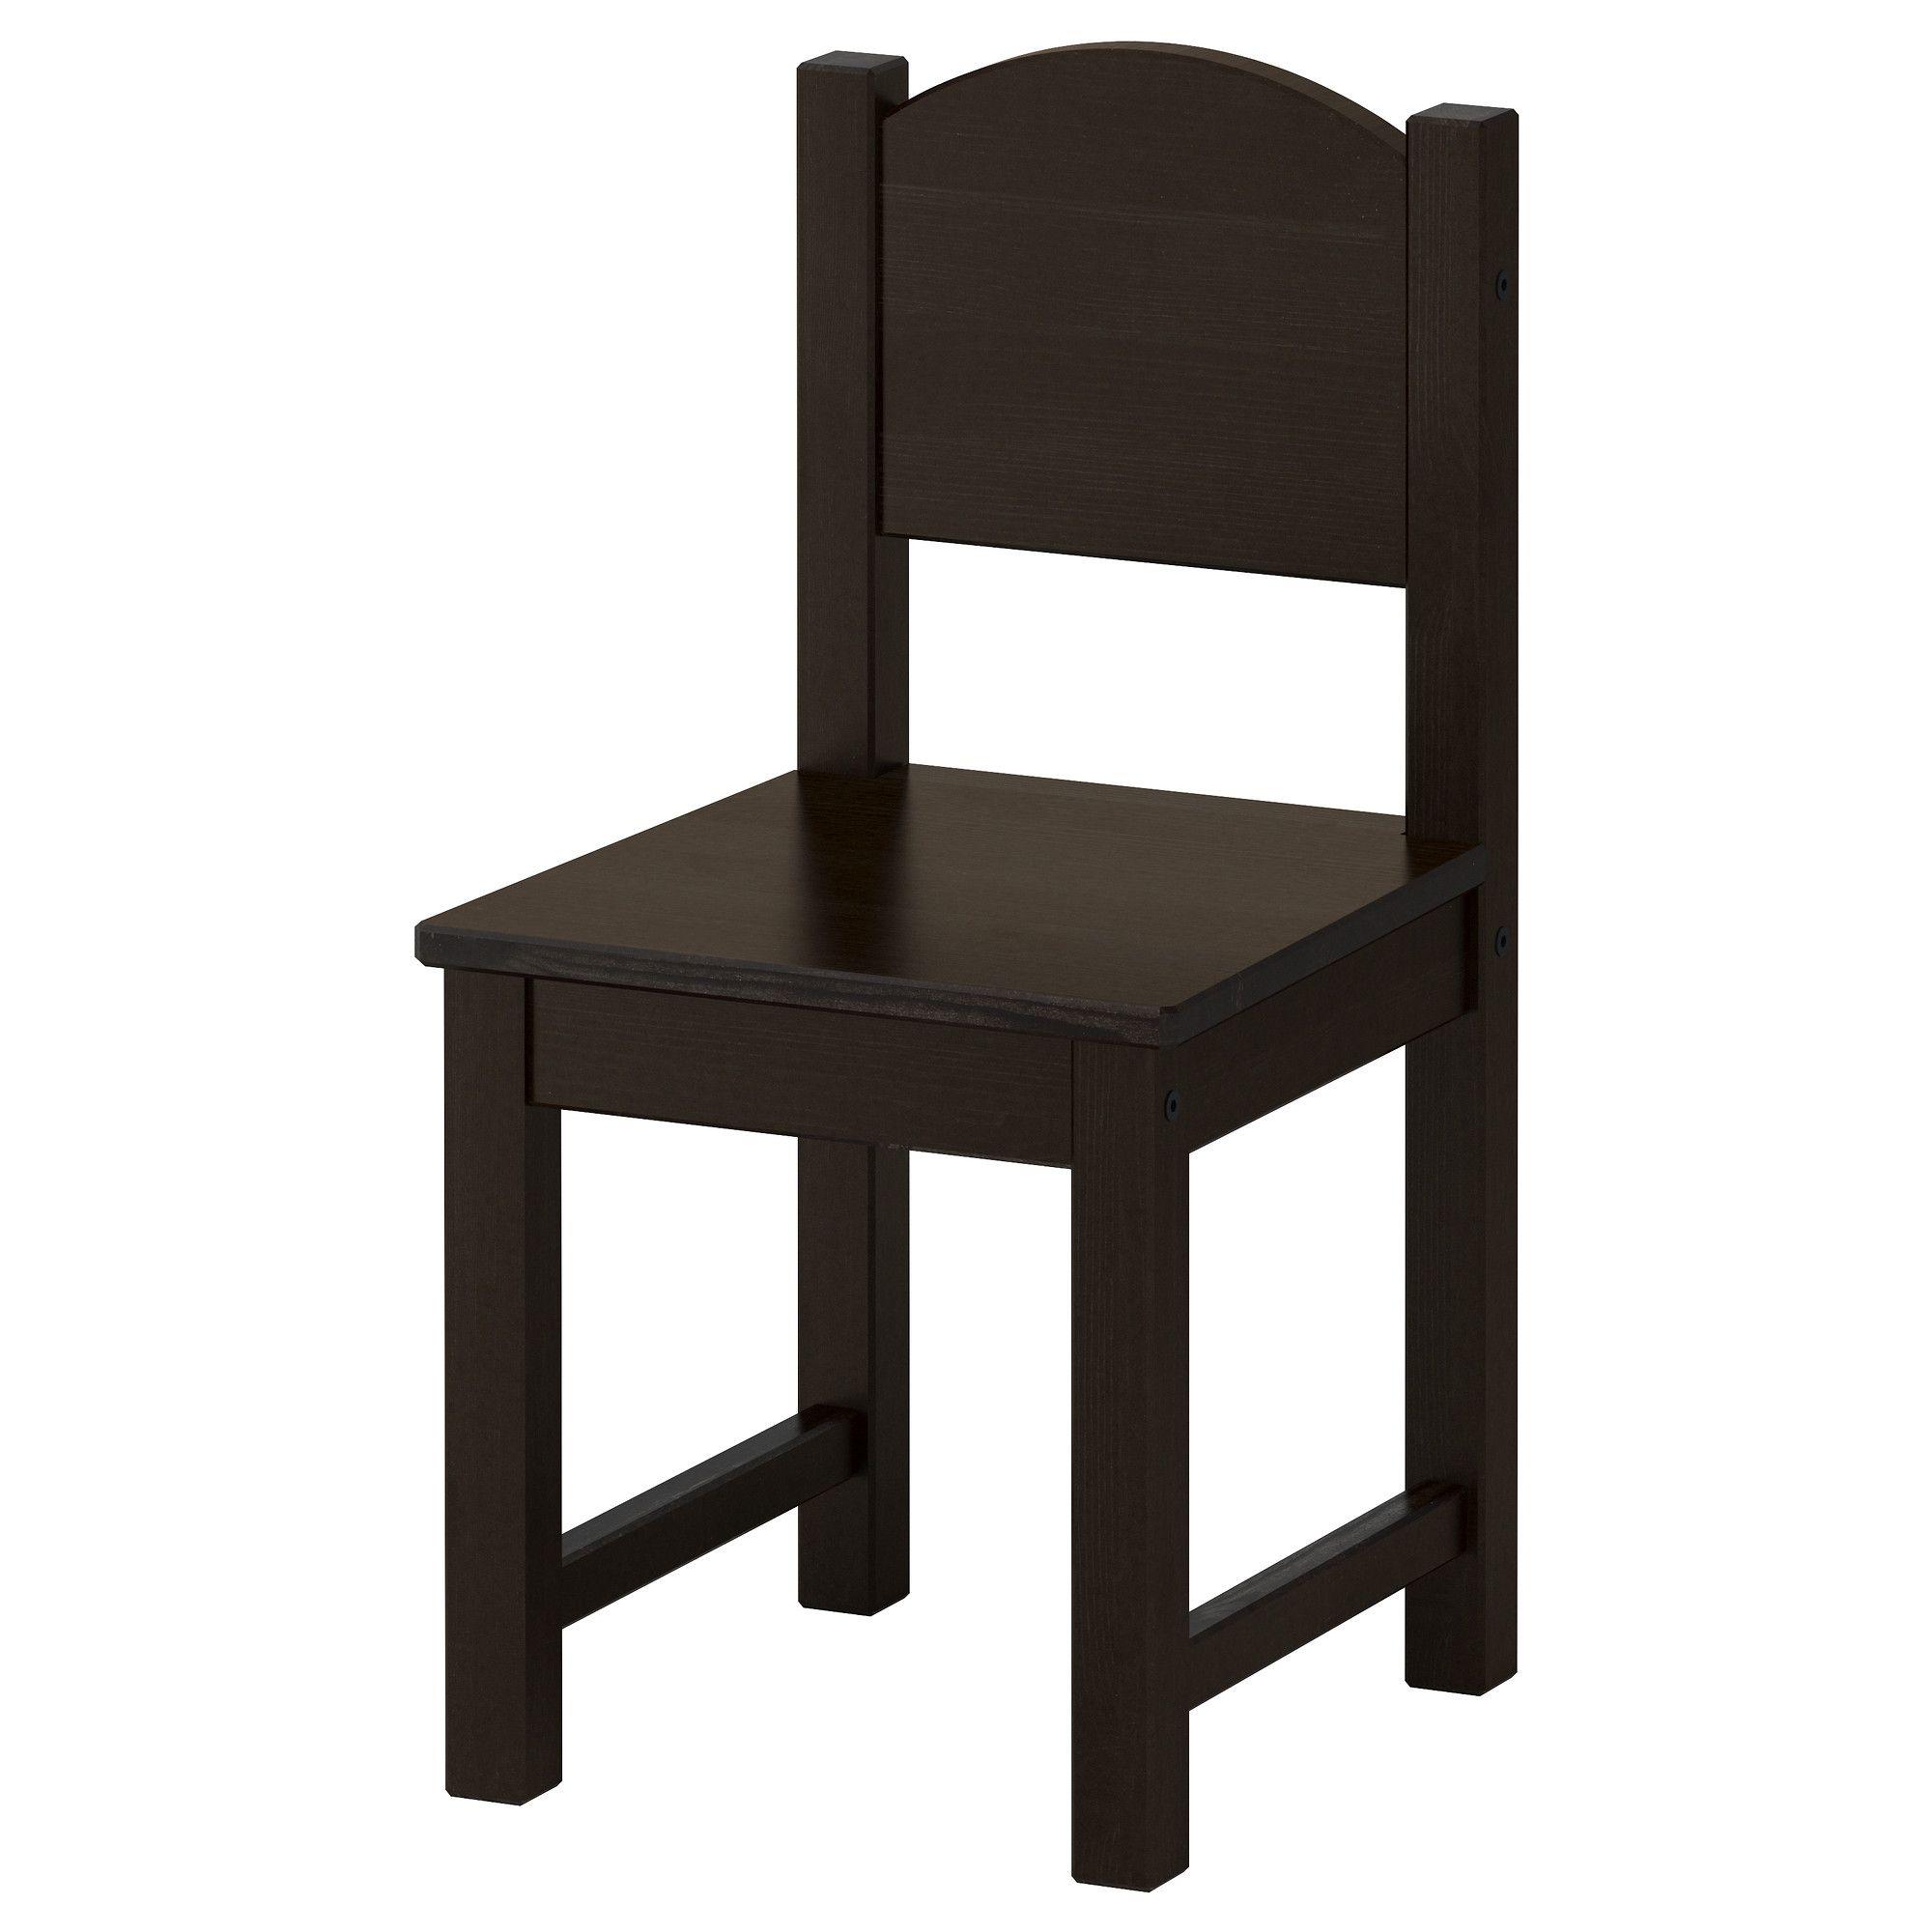 sundvik children 39 s chair black brown ikea i 39 d probably let it be known i will possess. Black Bedroom Furniture Sets. Home Design Ideas